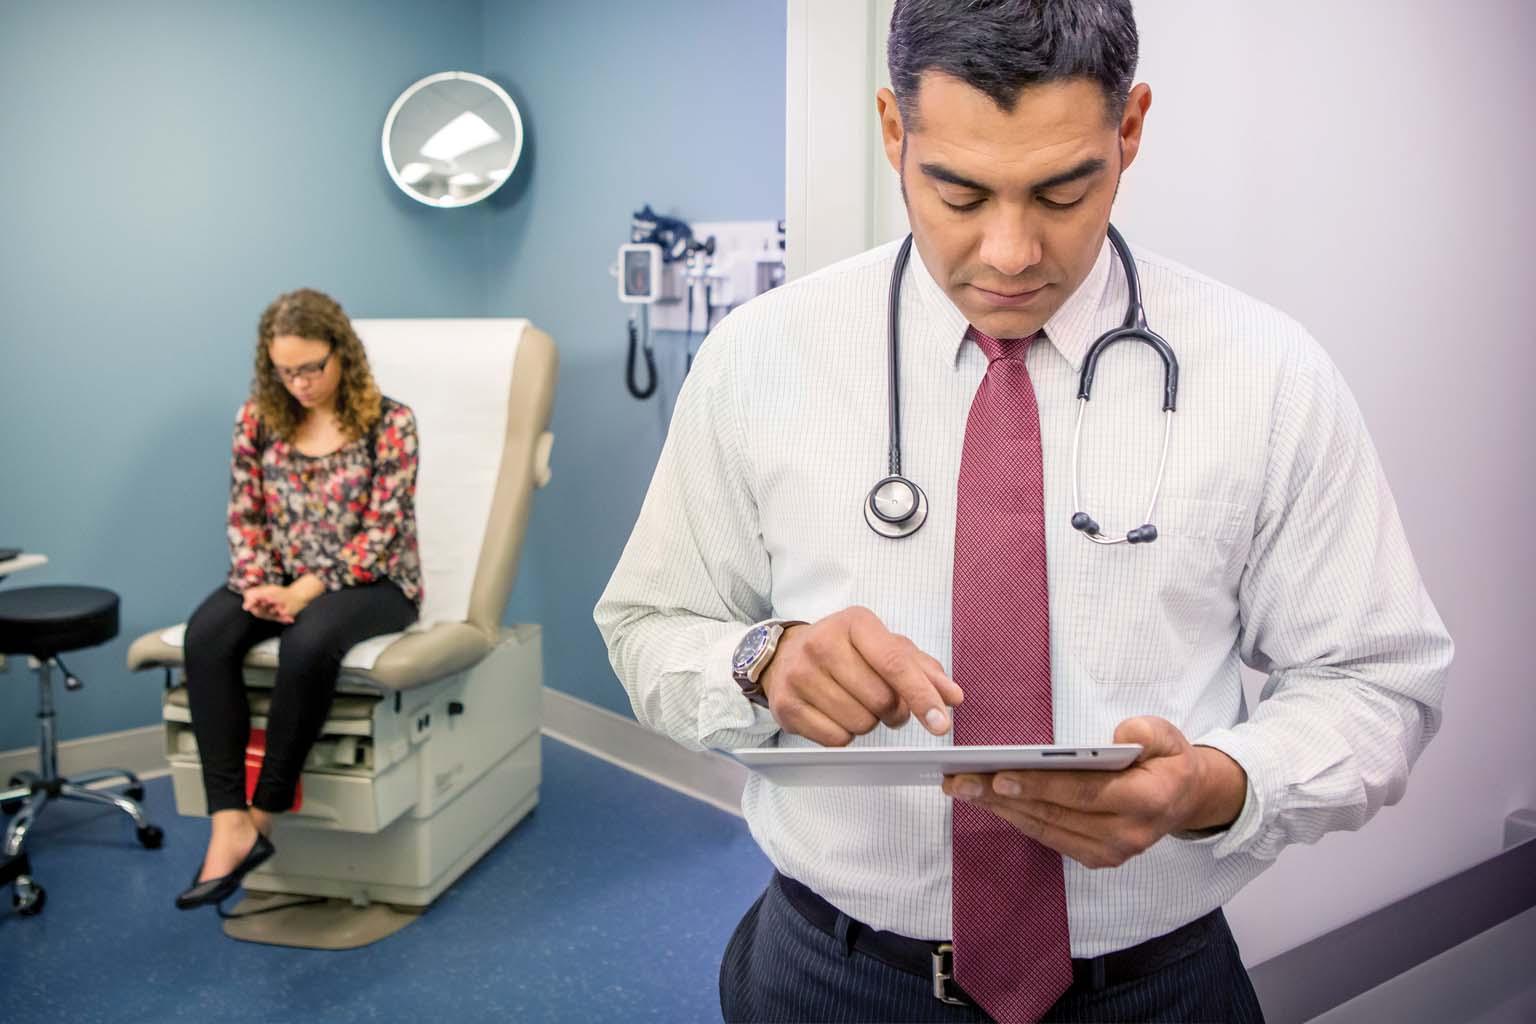 doctor with patient in exam room